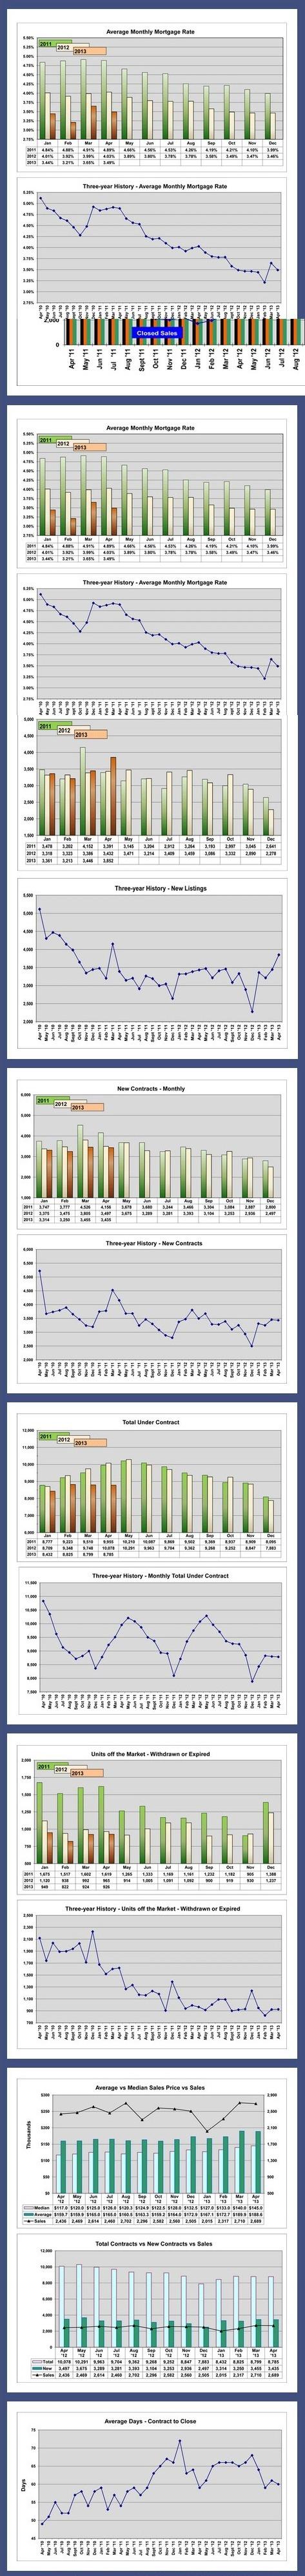 Orlando Market Pulse Stats 2